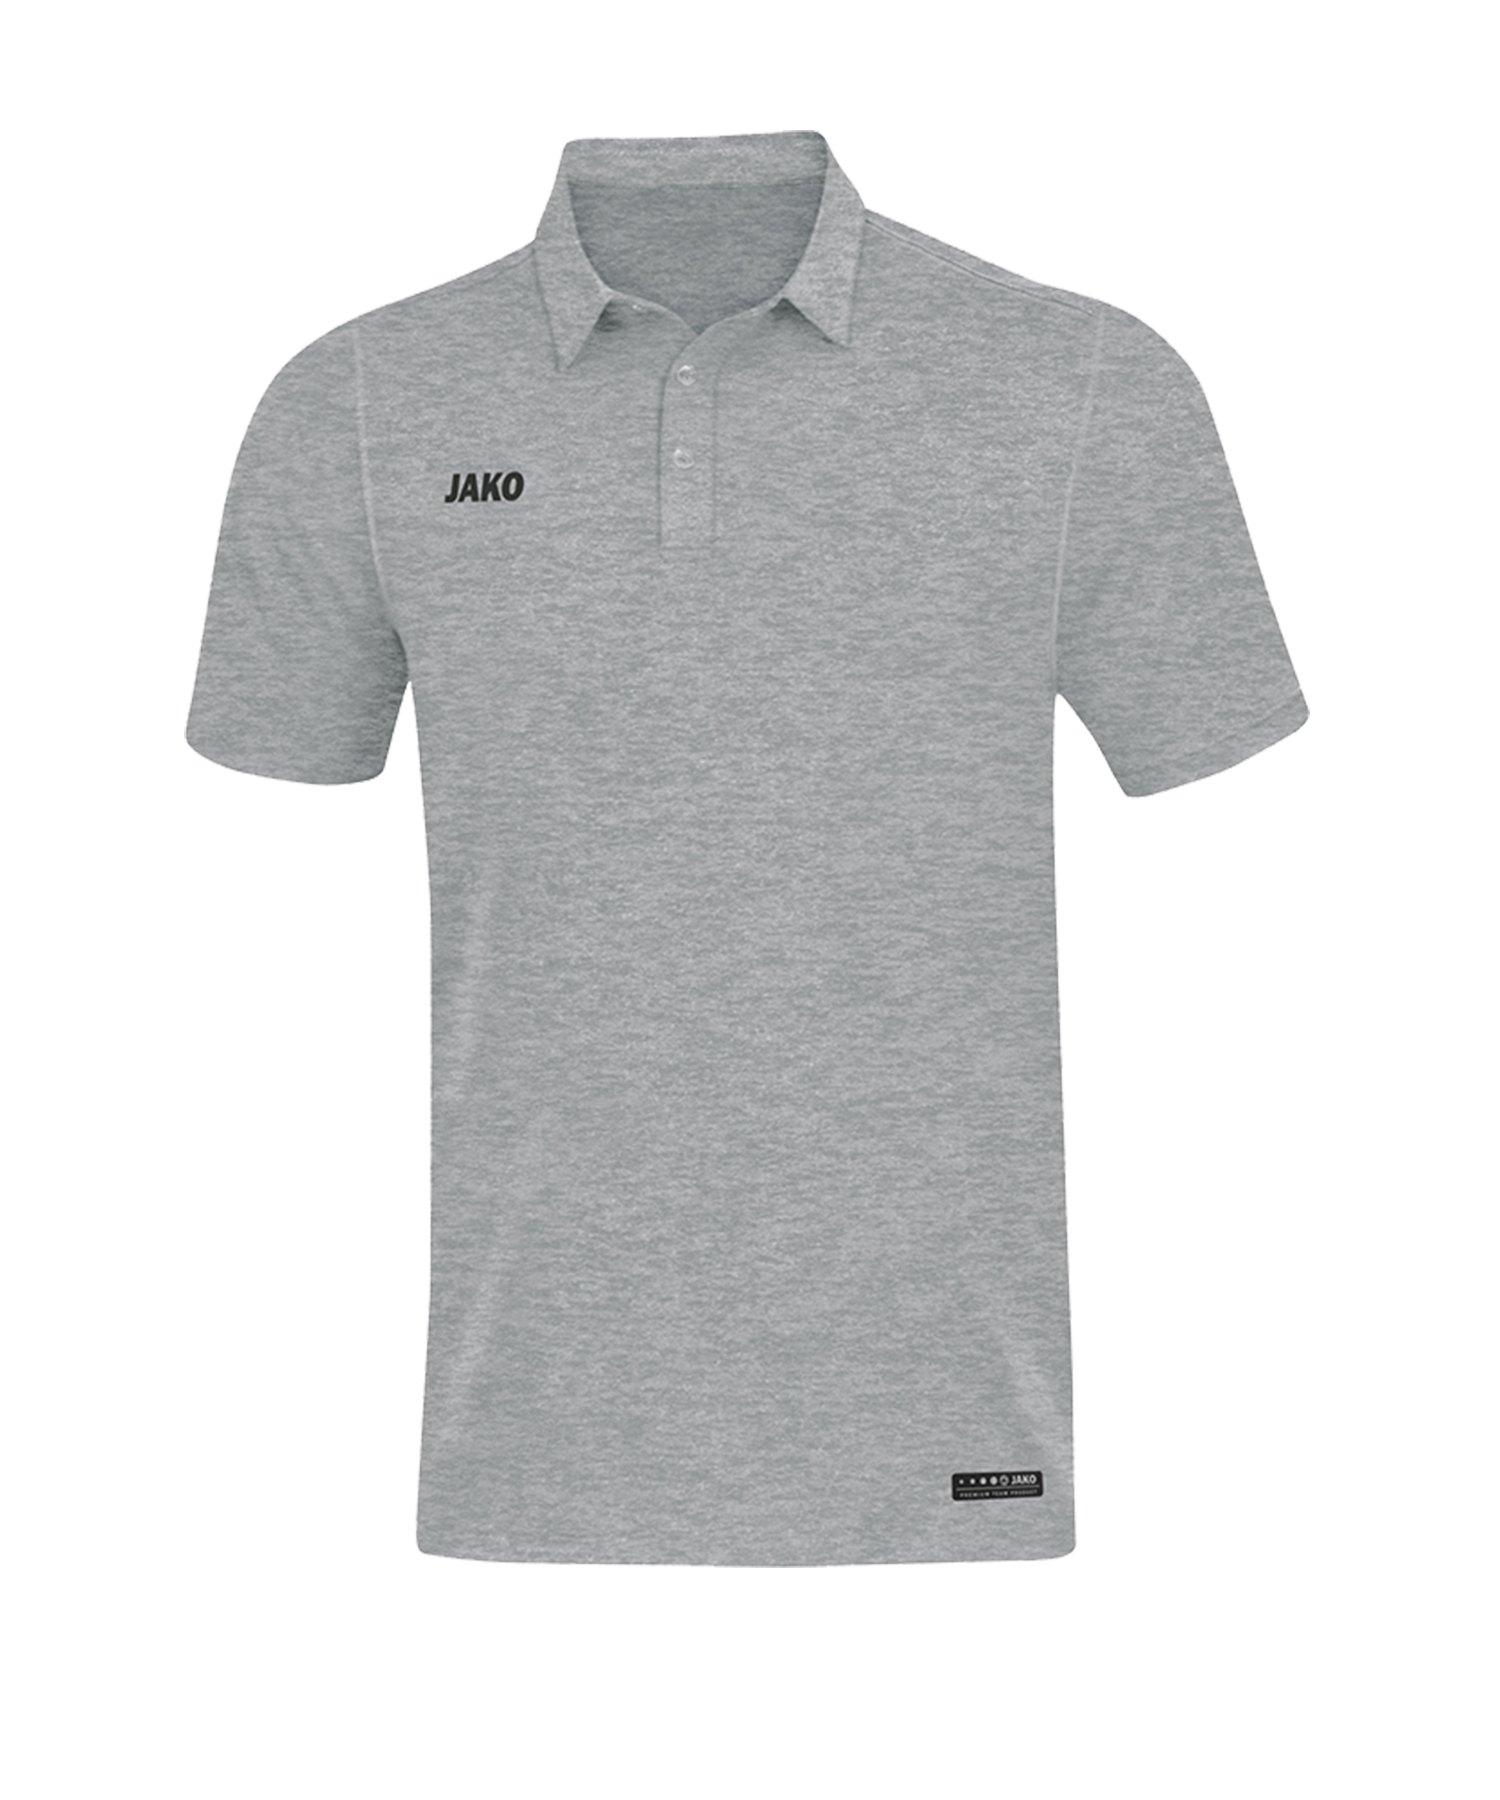 Jako Premium Basics Poloshirt Grau F40 - Grau